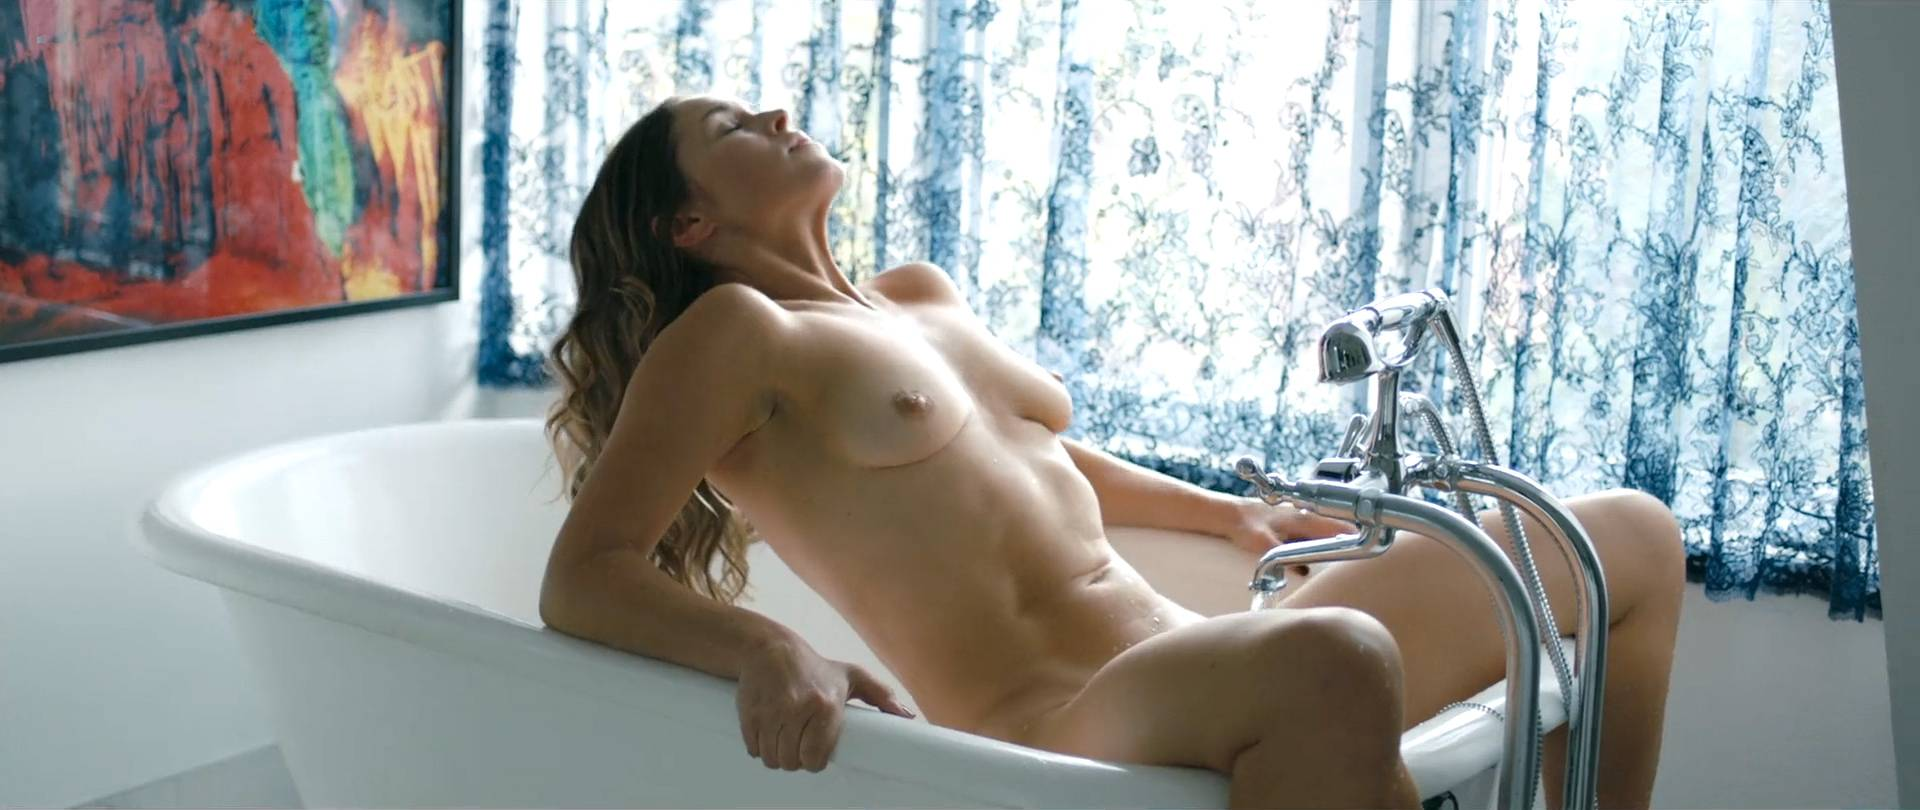 Natalie-Krill-nude-bush-Erika-Linder-nude-lot-of-sex-Below-Her-Mouth-2016-HD-1080p-Web-004.jpg